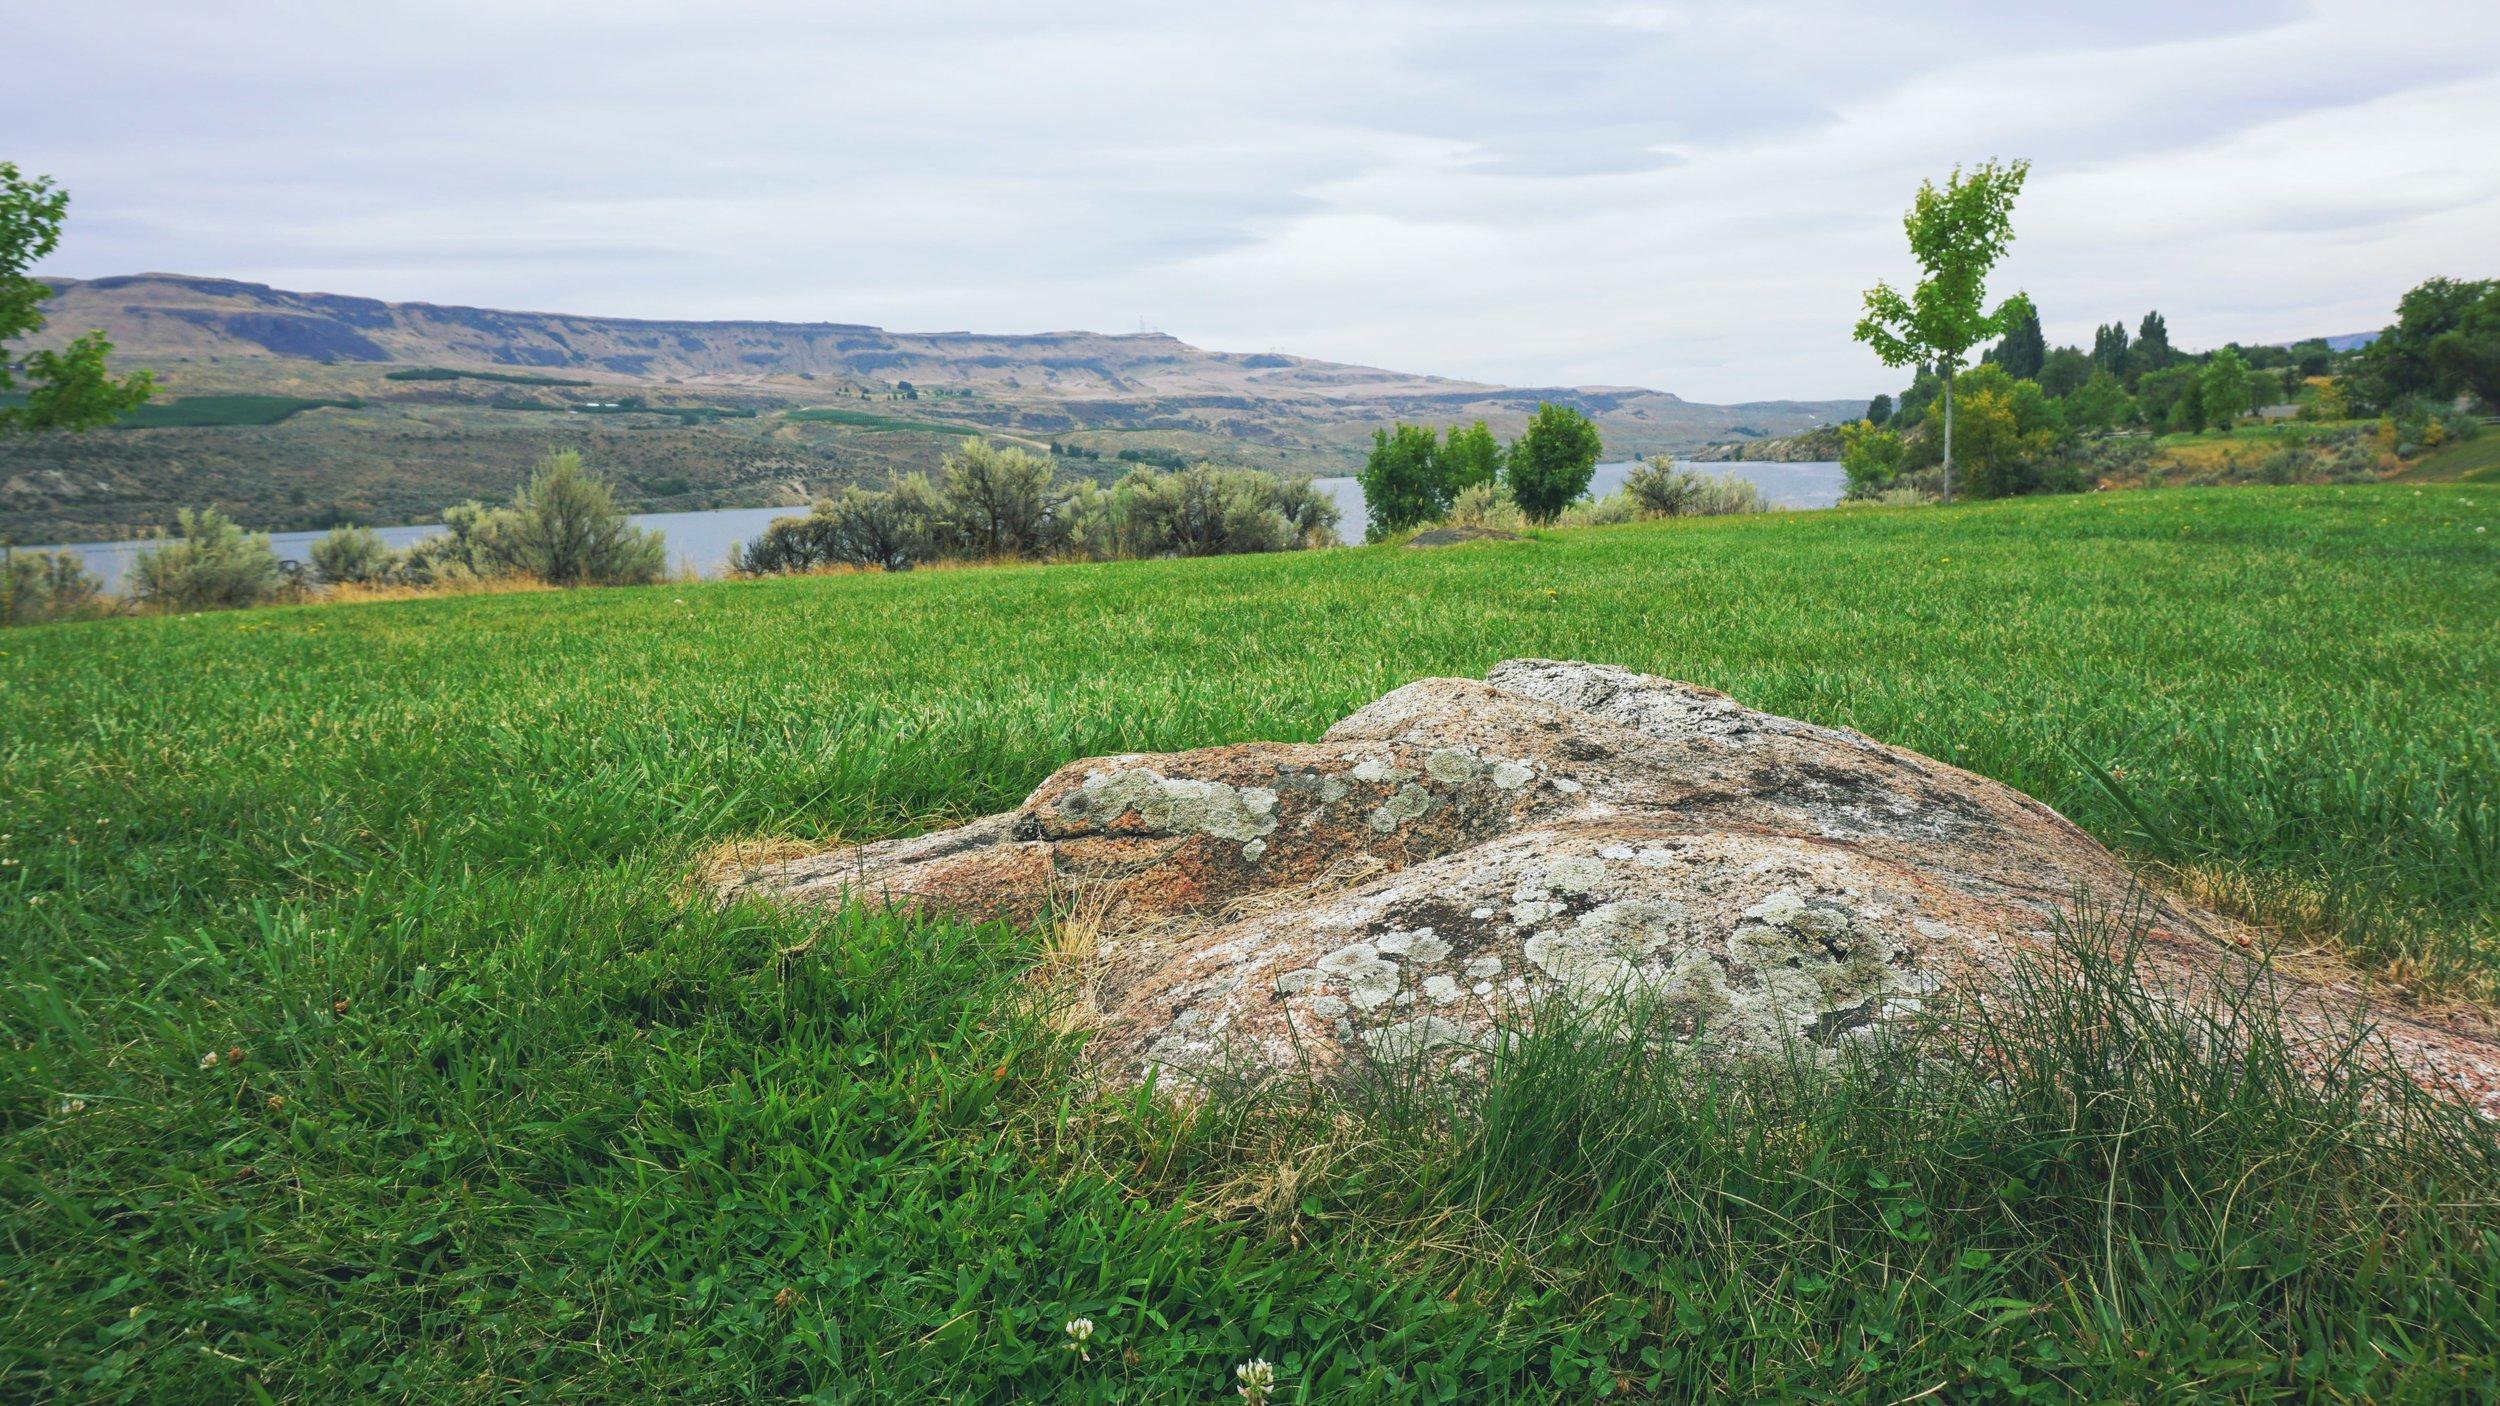 Bridgeport State Park overlooking the Columbia River